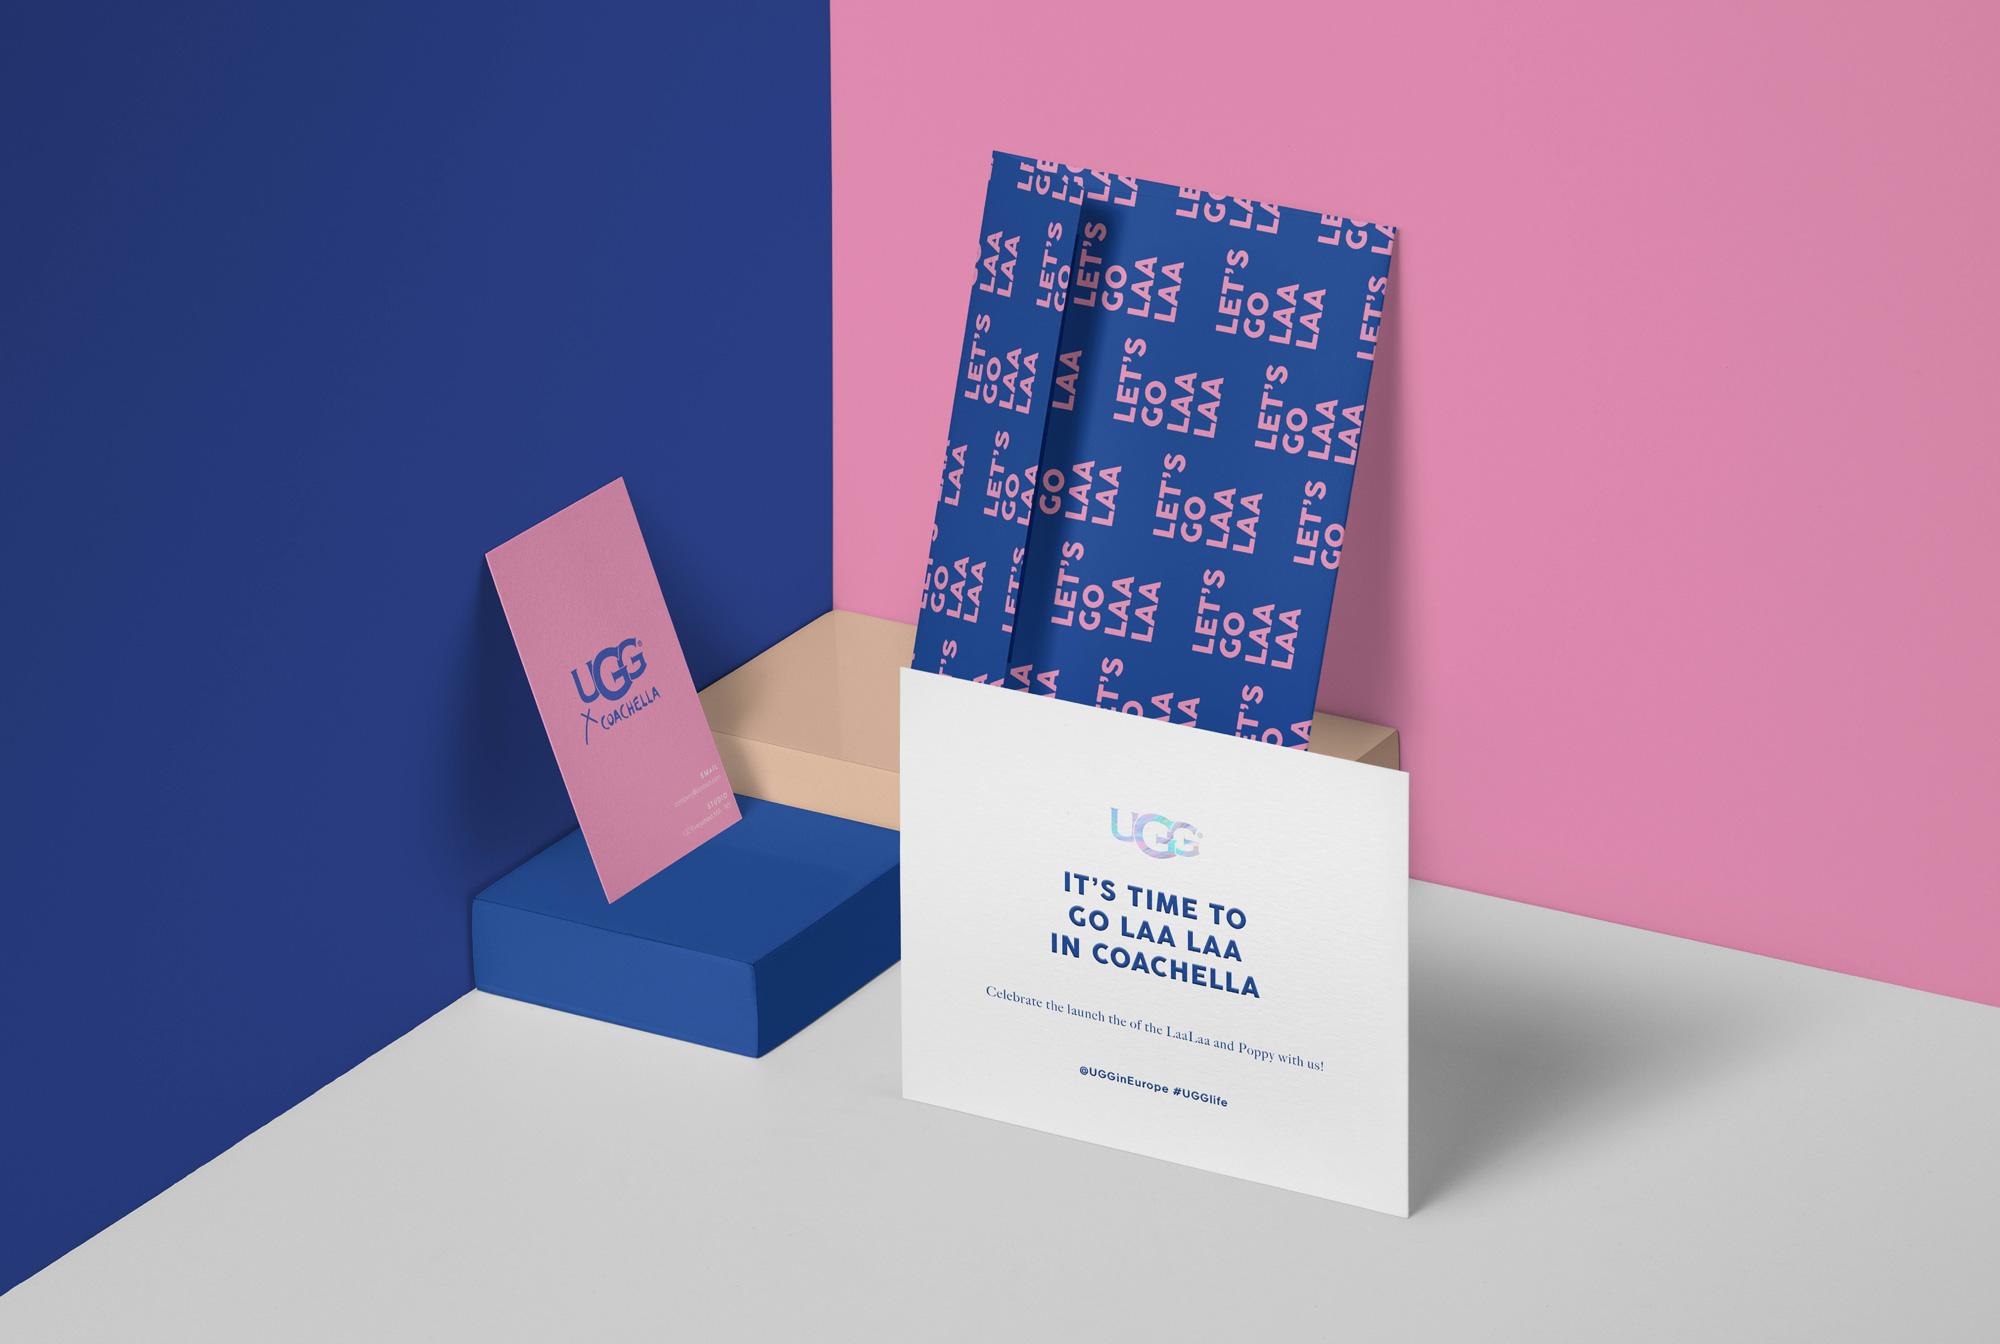 UGG_Coachella_Packaging-Design_Infuencer-Mailers_2